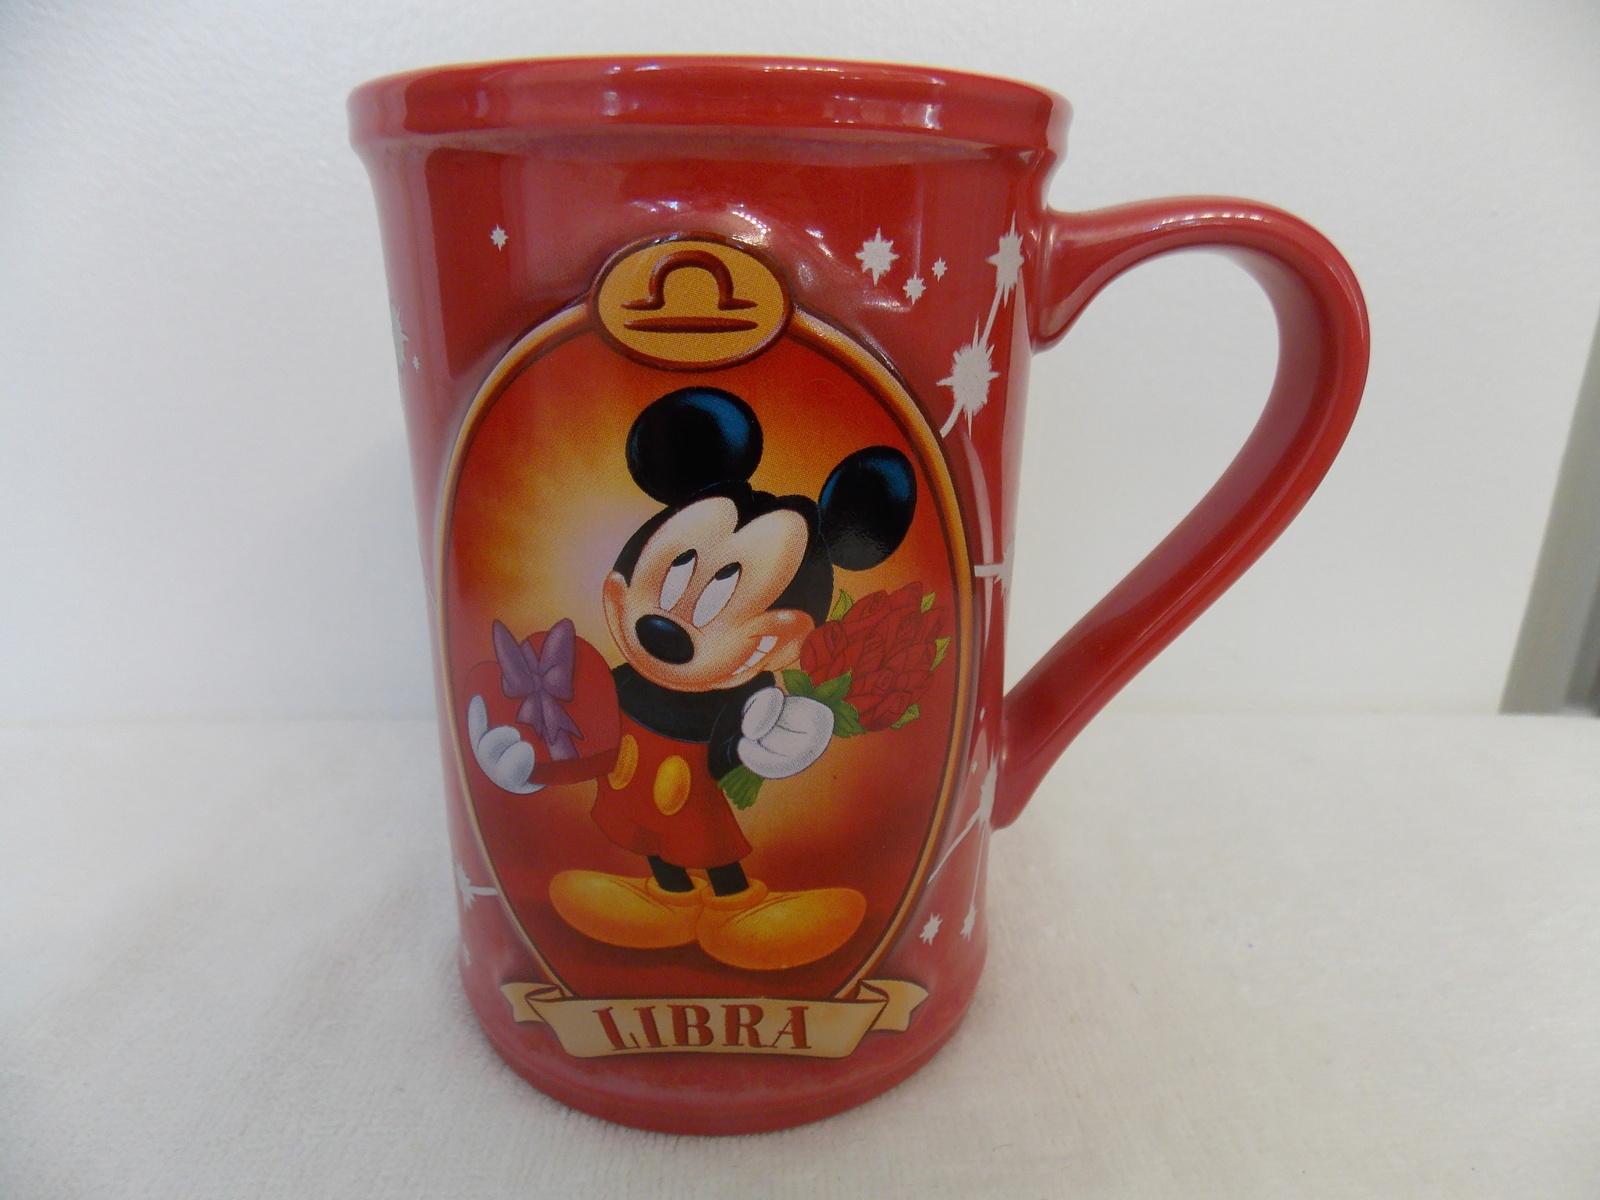 Disney Mickey Mouse Libra Tall Coffee Mug